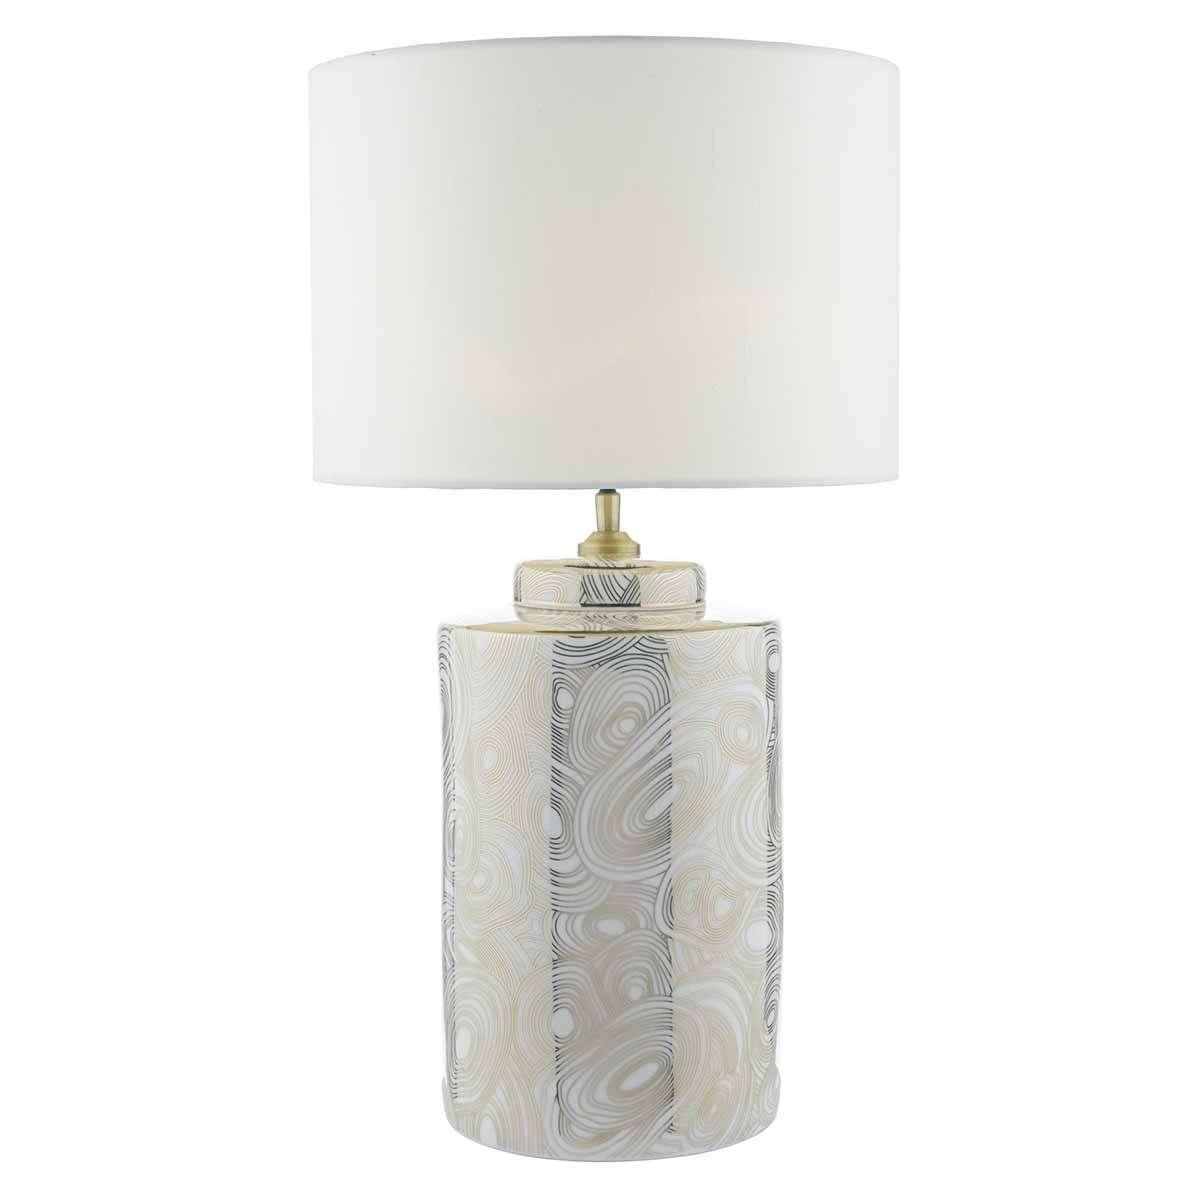 Ayesha Table Lamp White & Gold Base Only